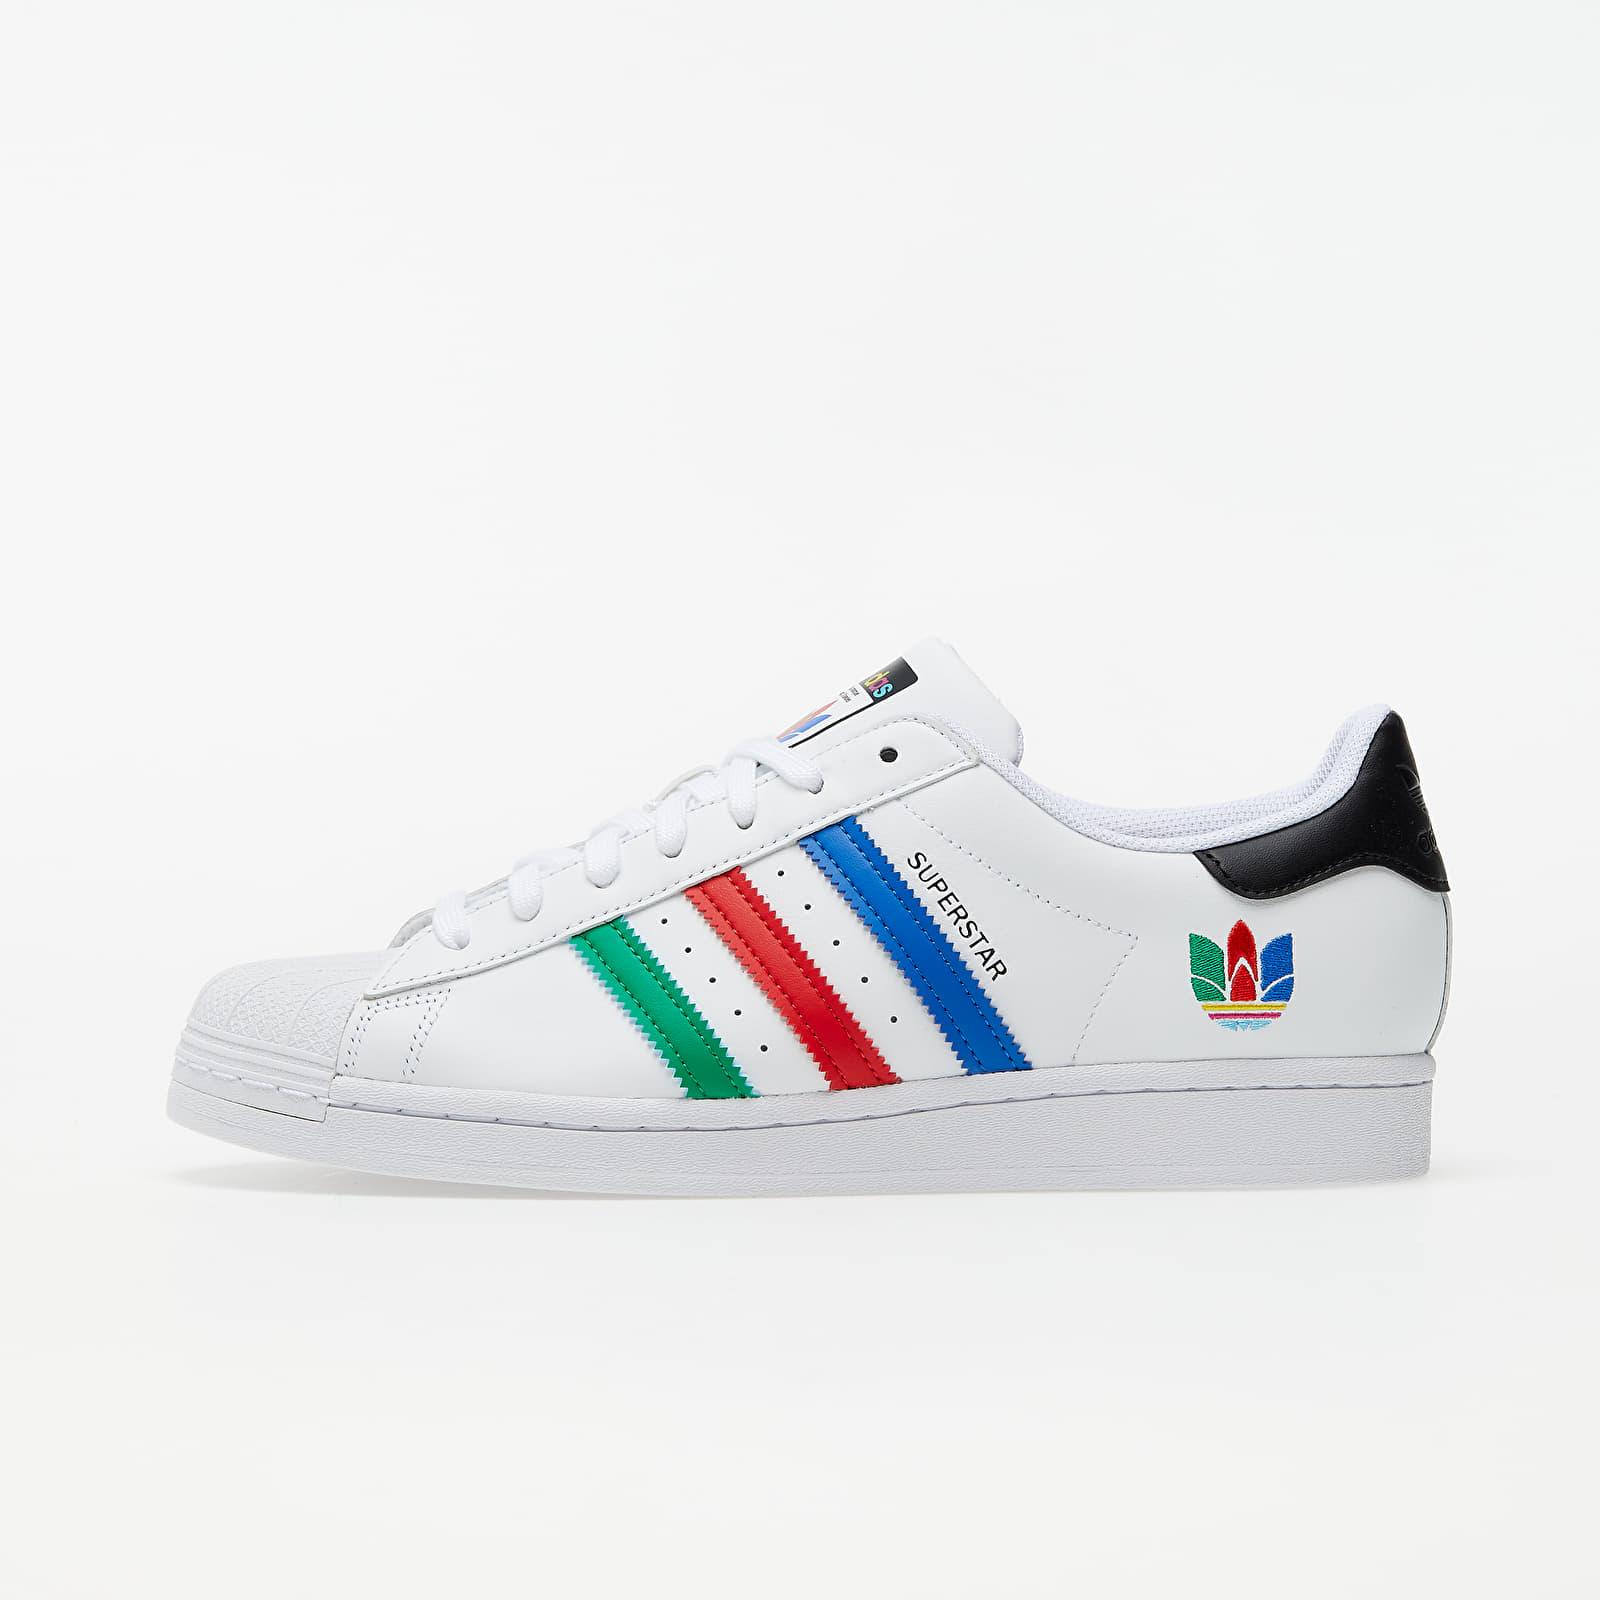 Men's shoes adidas Superstar Ftw White/ Green/ Core Black